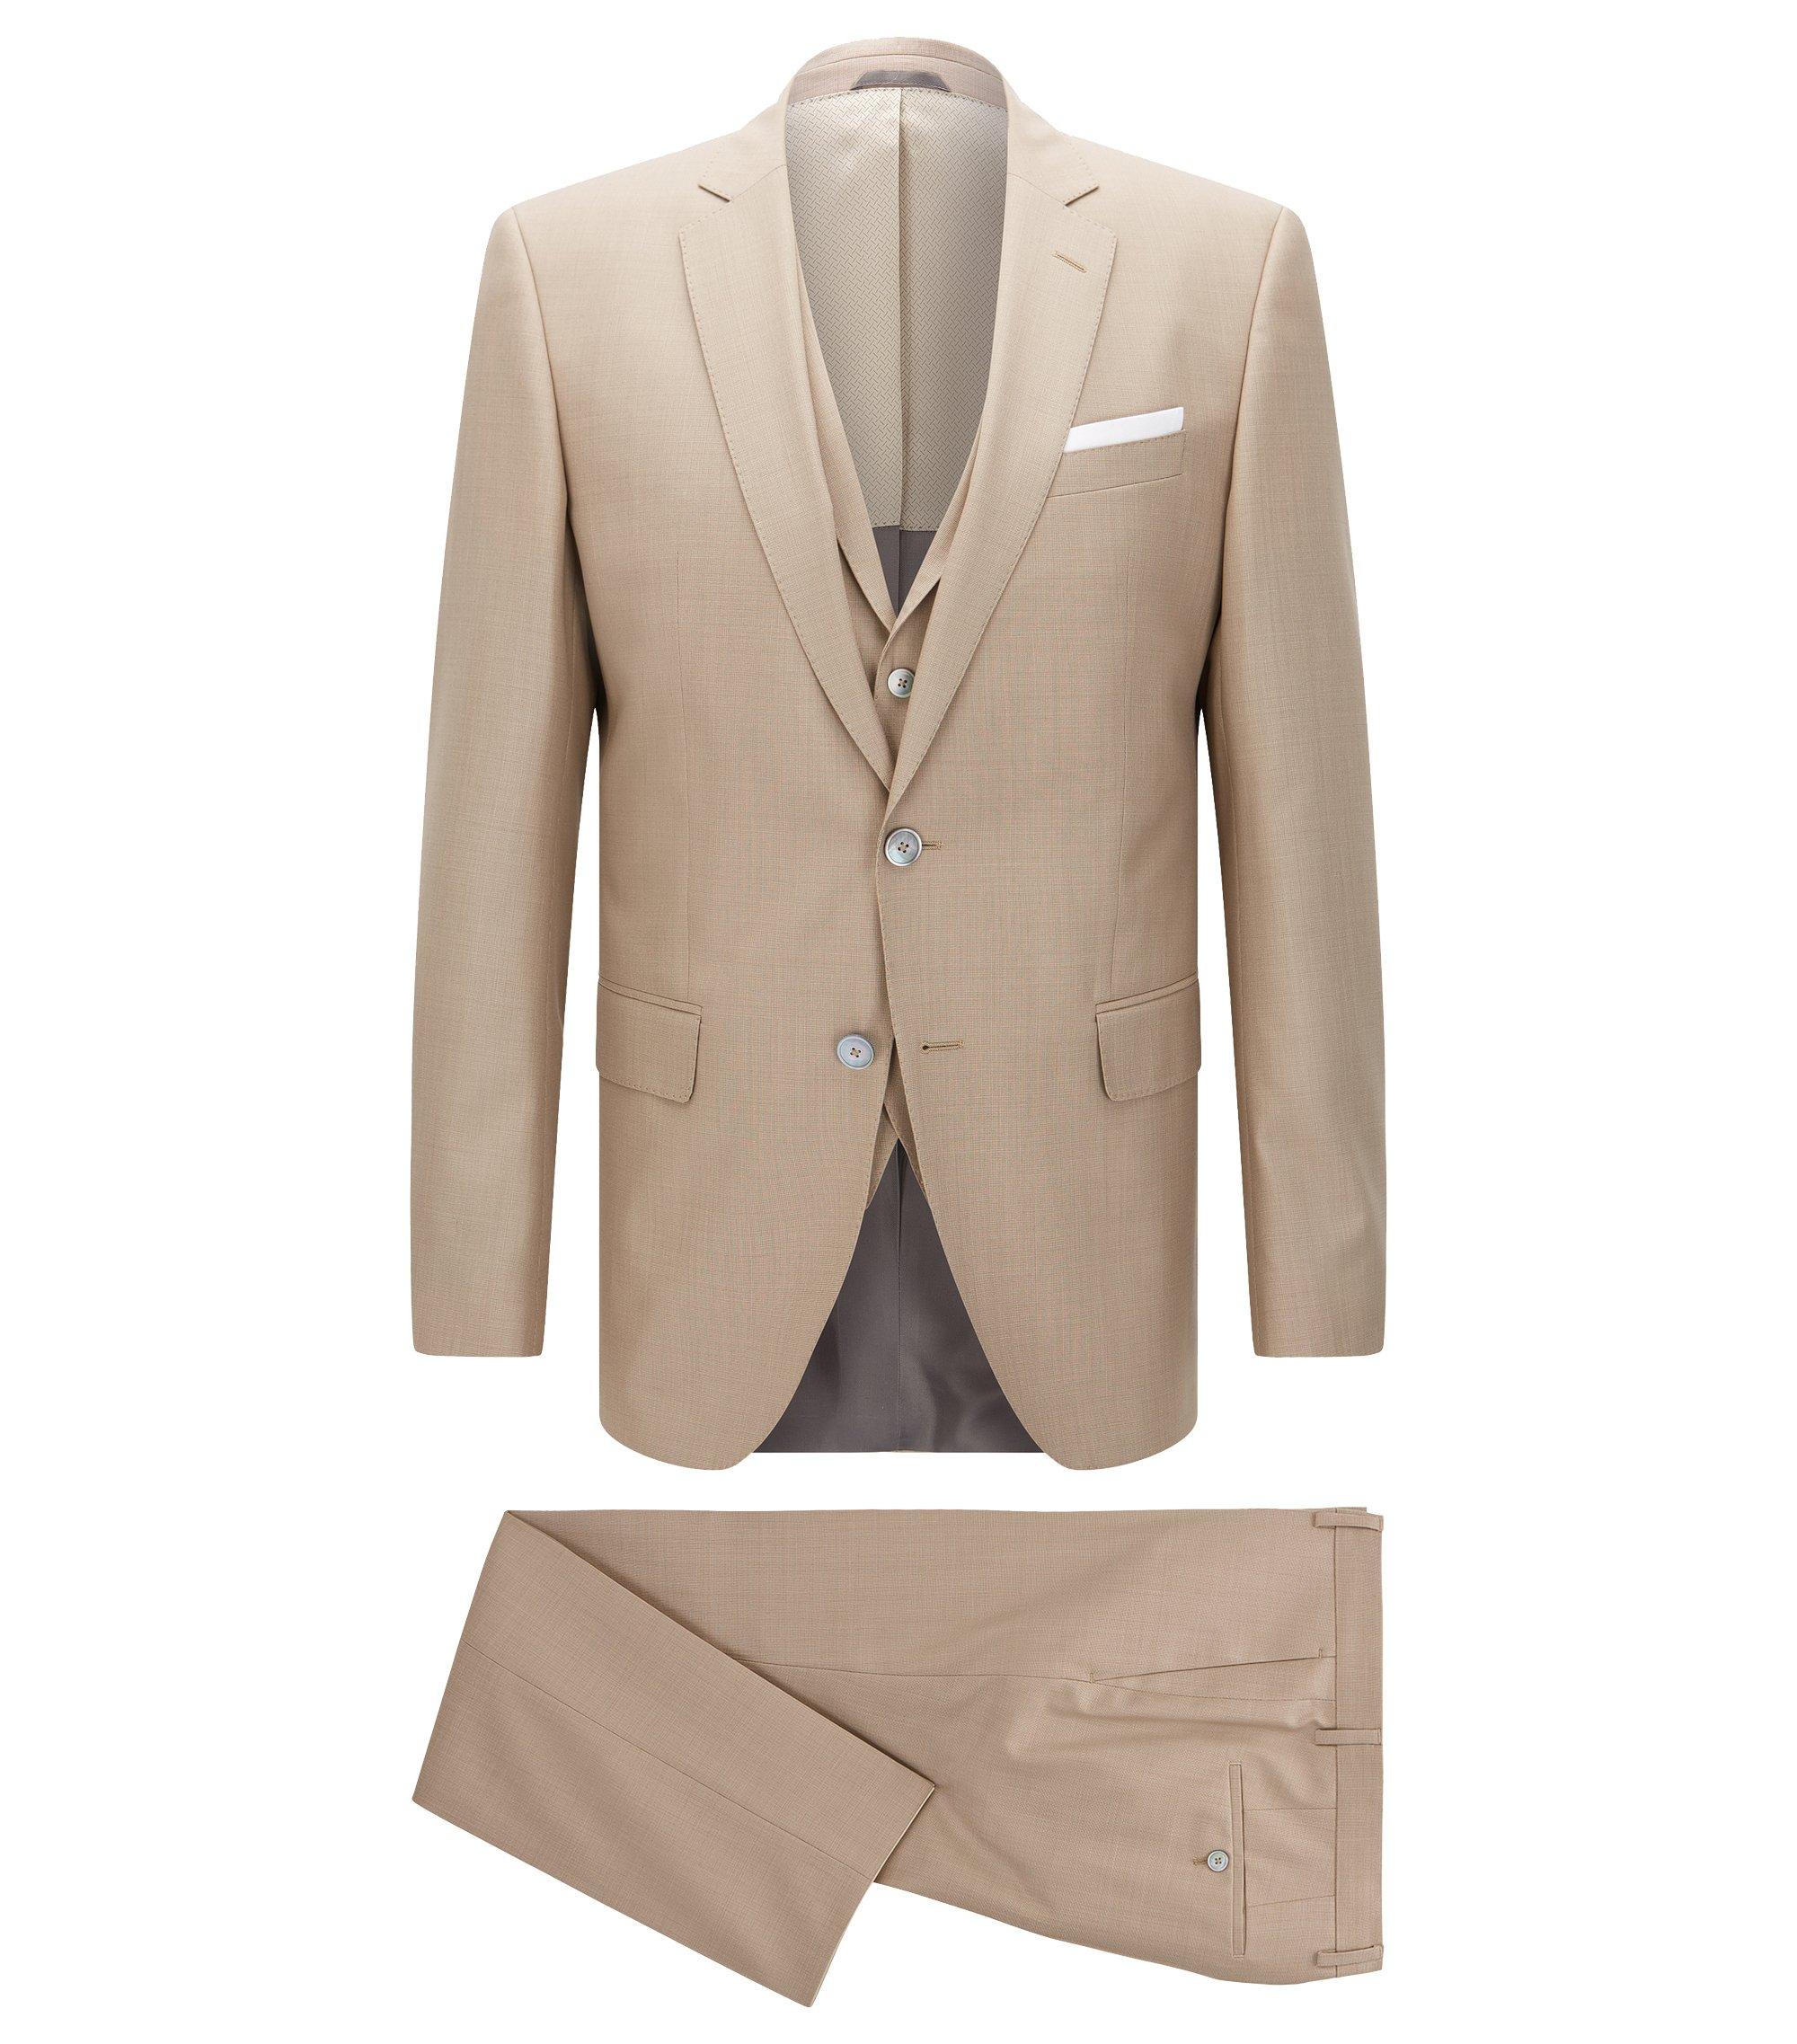 Virgin Wool Silk 3-Piece Suit, Slim Fit | Hutson/Gander, Open Beige